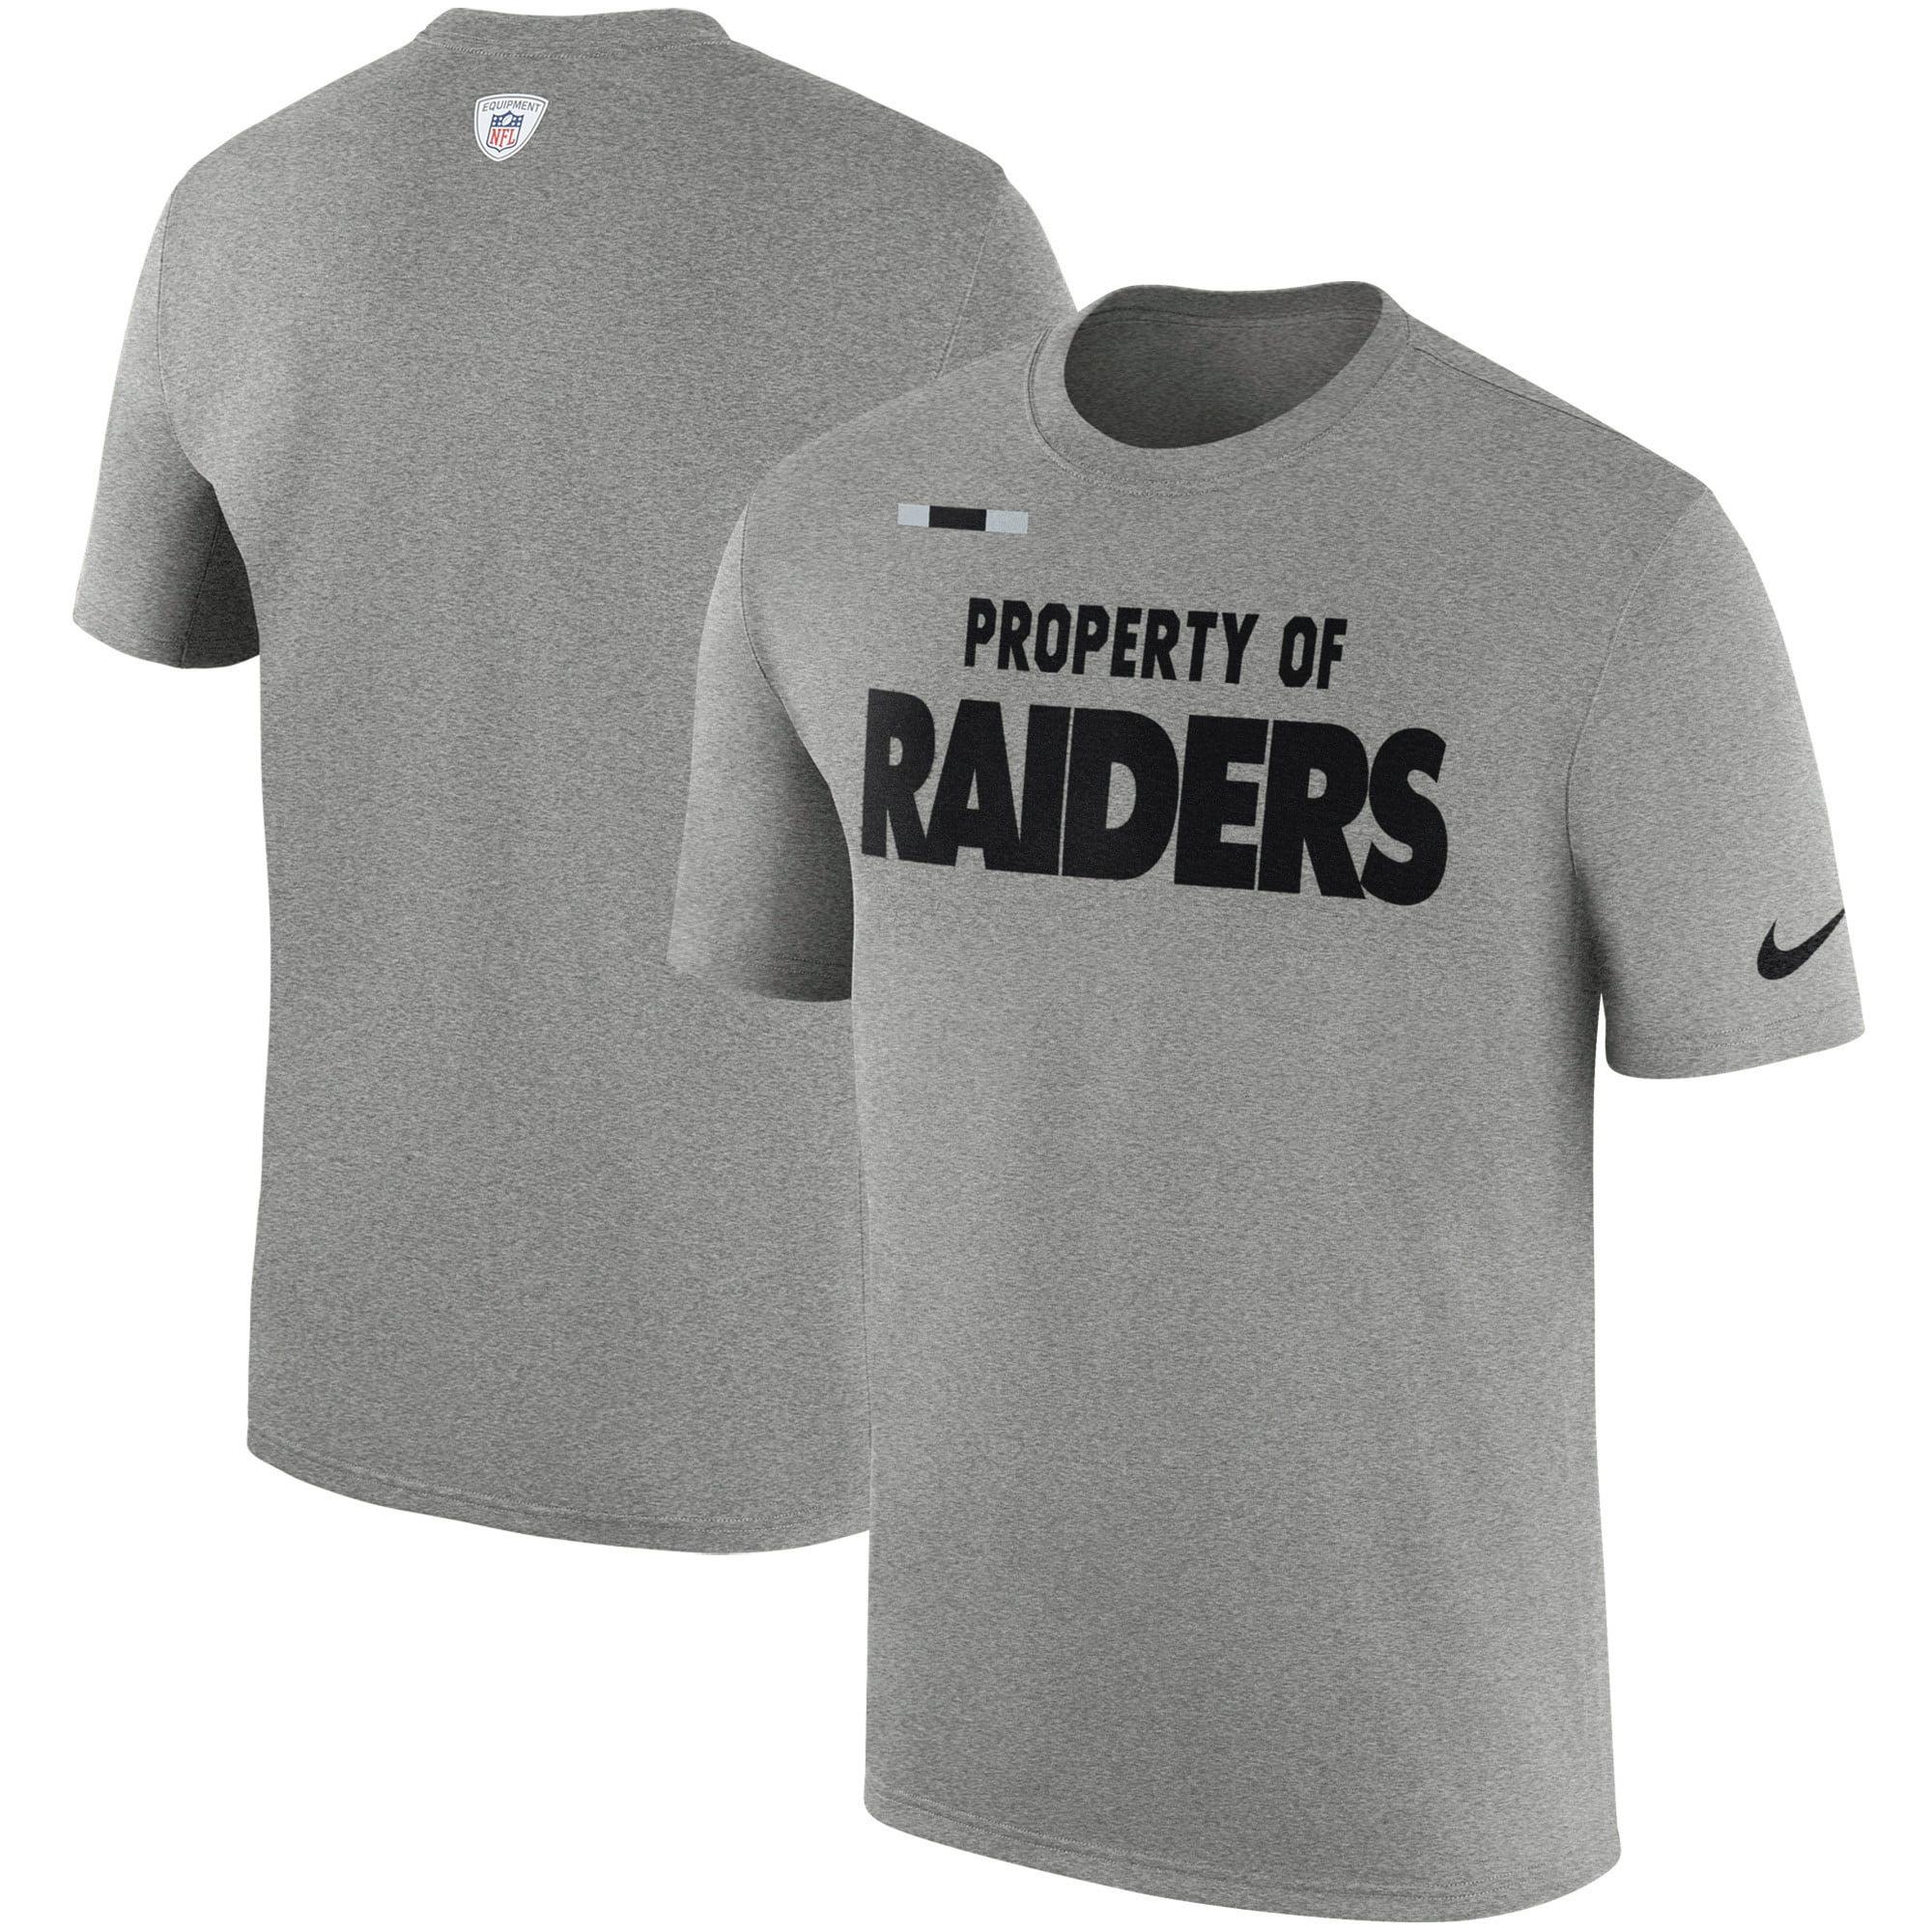 Oakland Raiders Nike Sideline Property Of Facility T-Shirt - Heather Gray